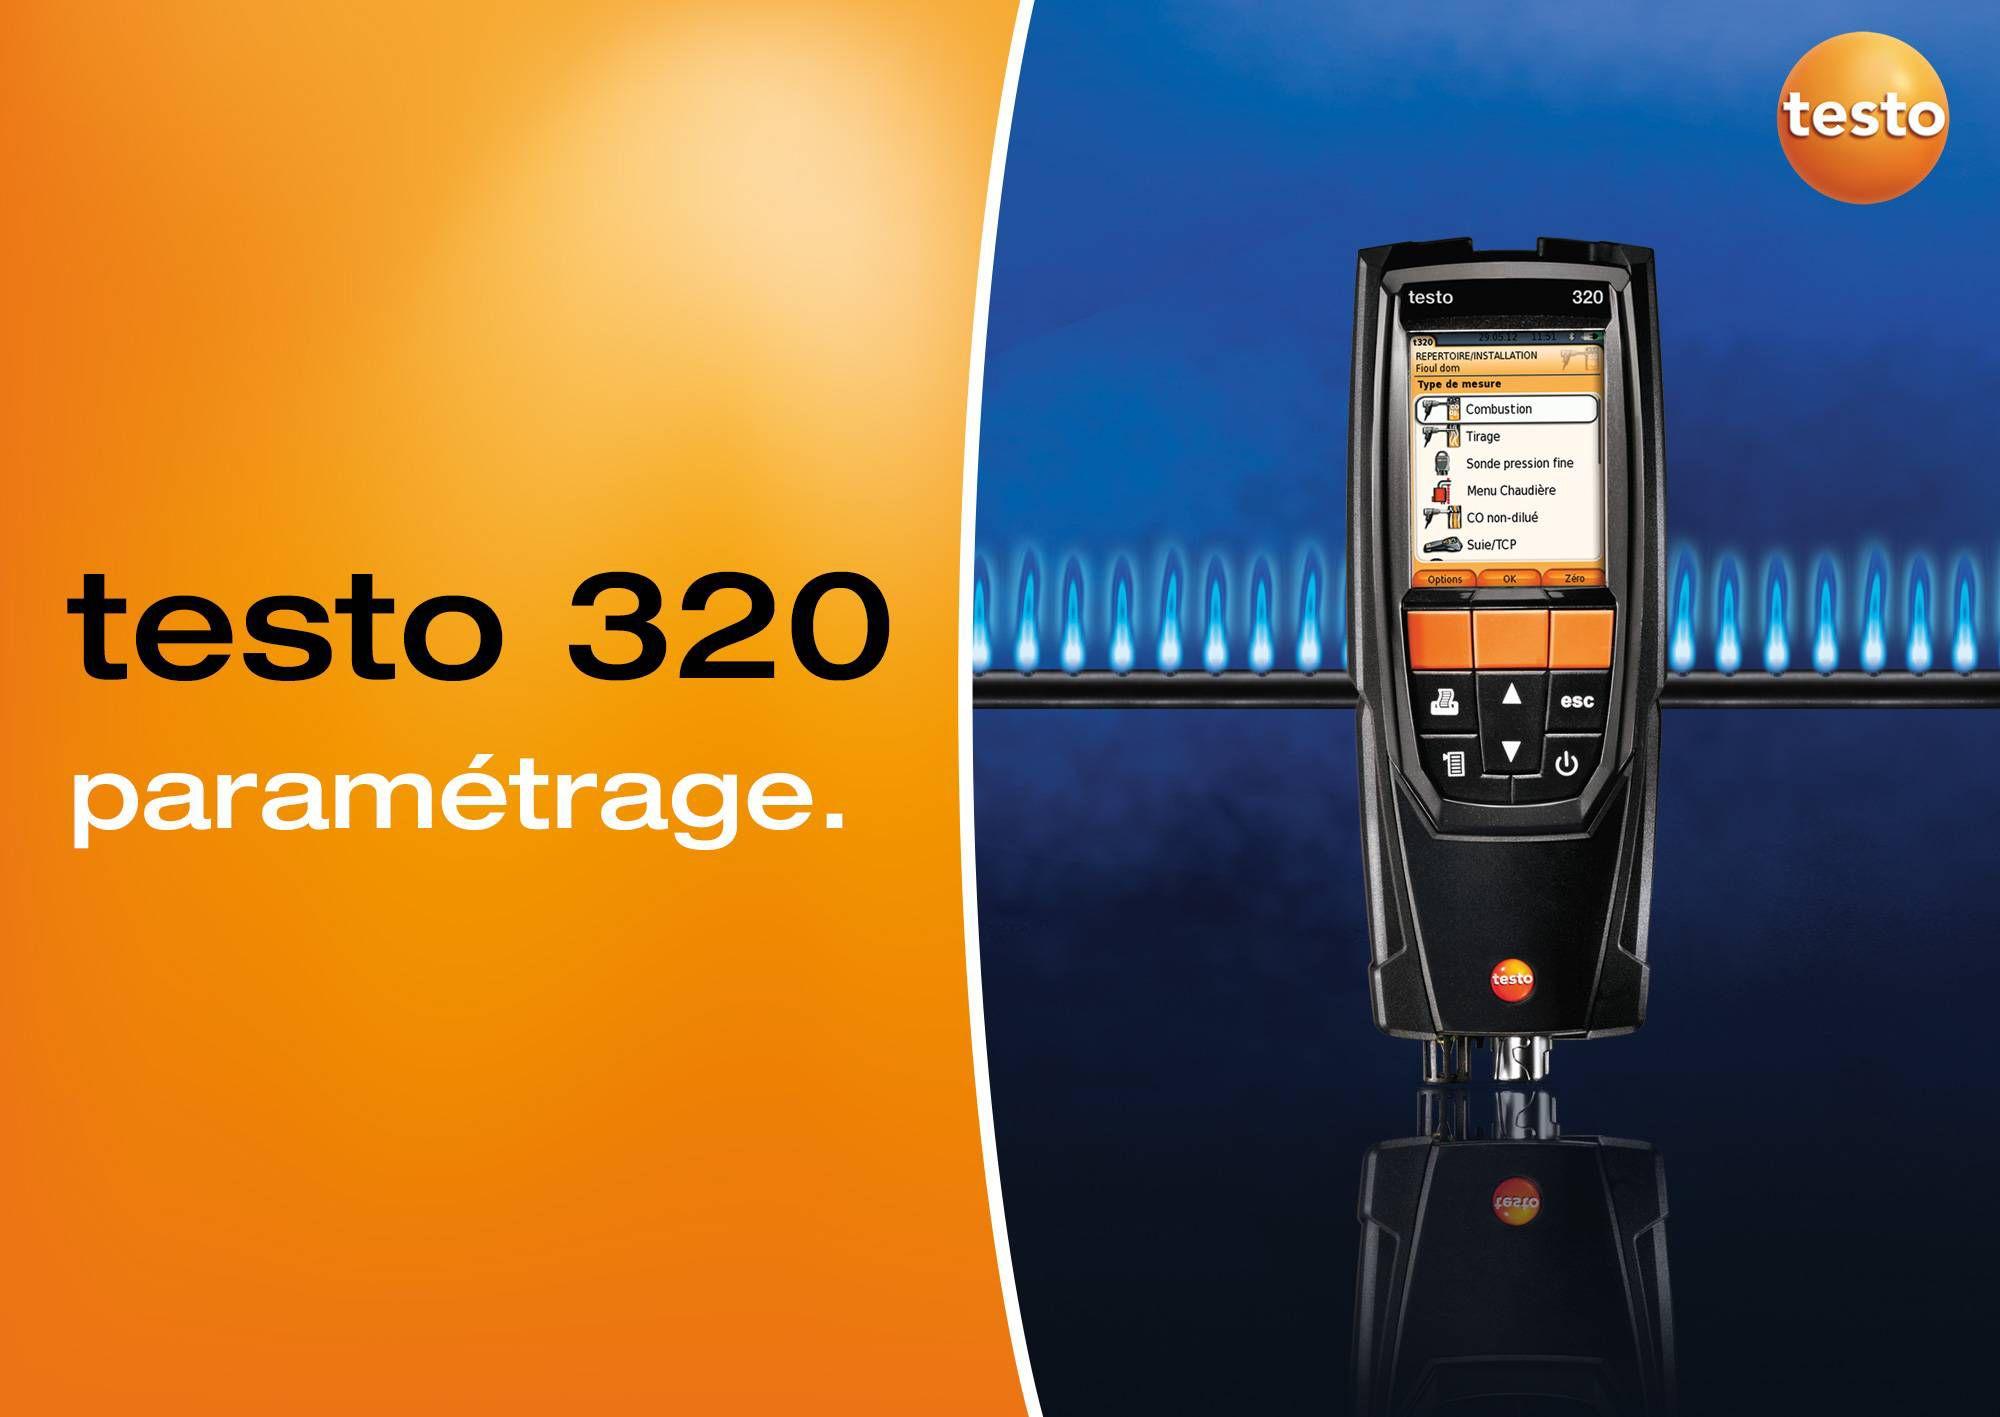 tutoriel vidéo paramétrage testo 320